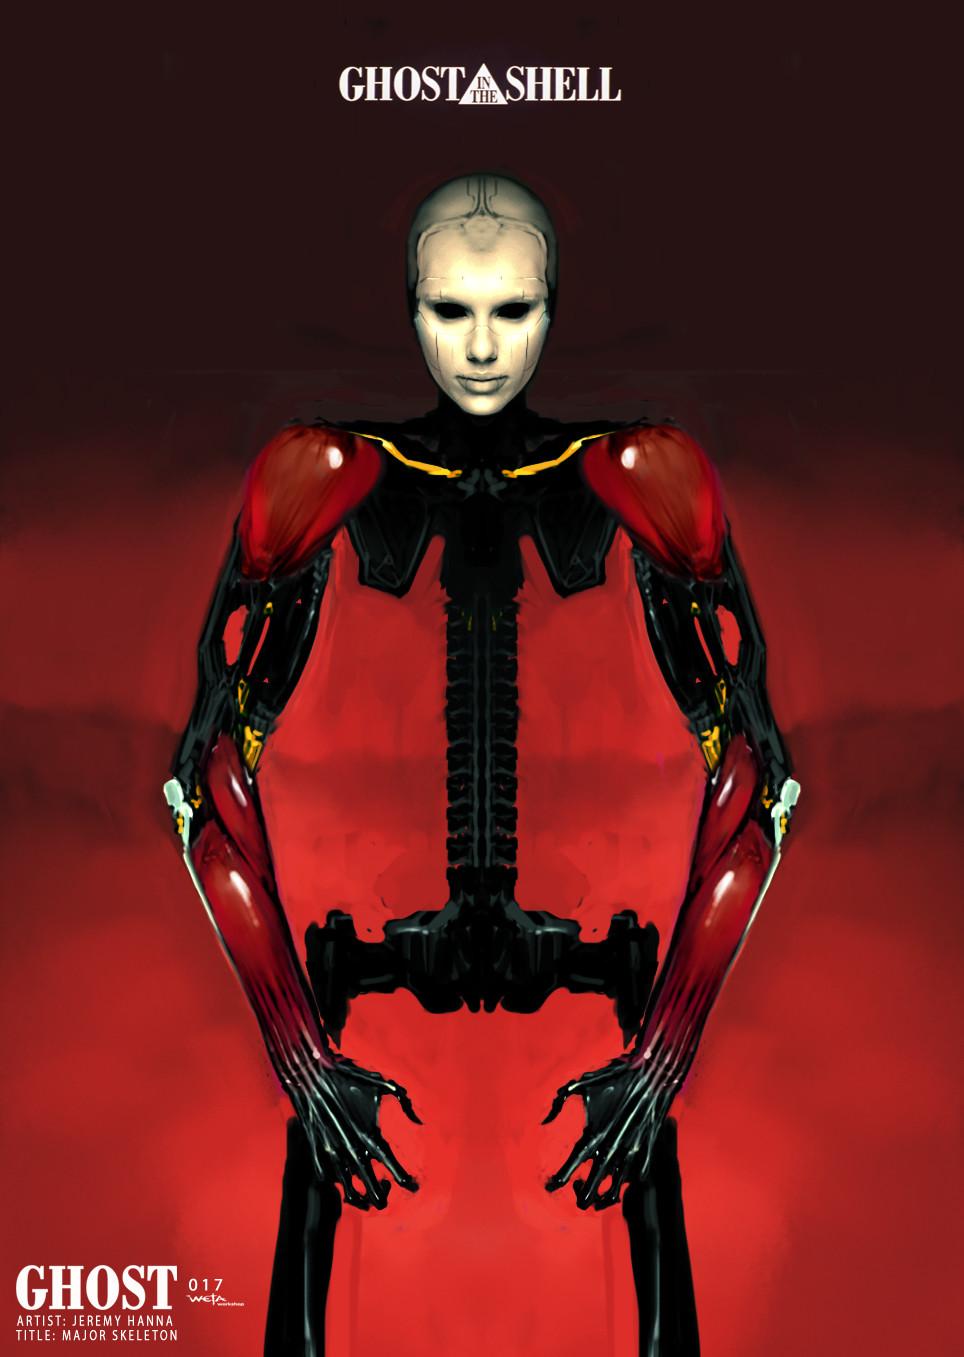 Major Skeleton - Artist: Jeremy Hanna